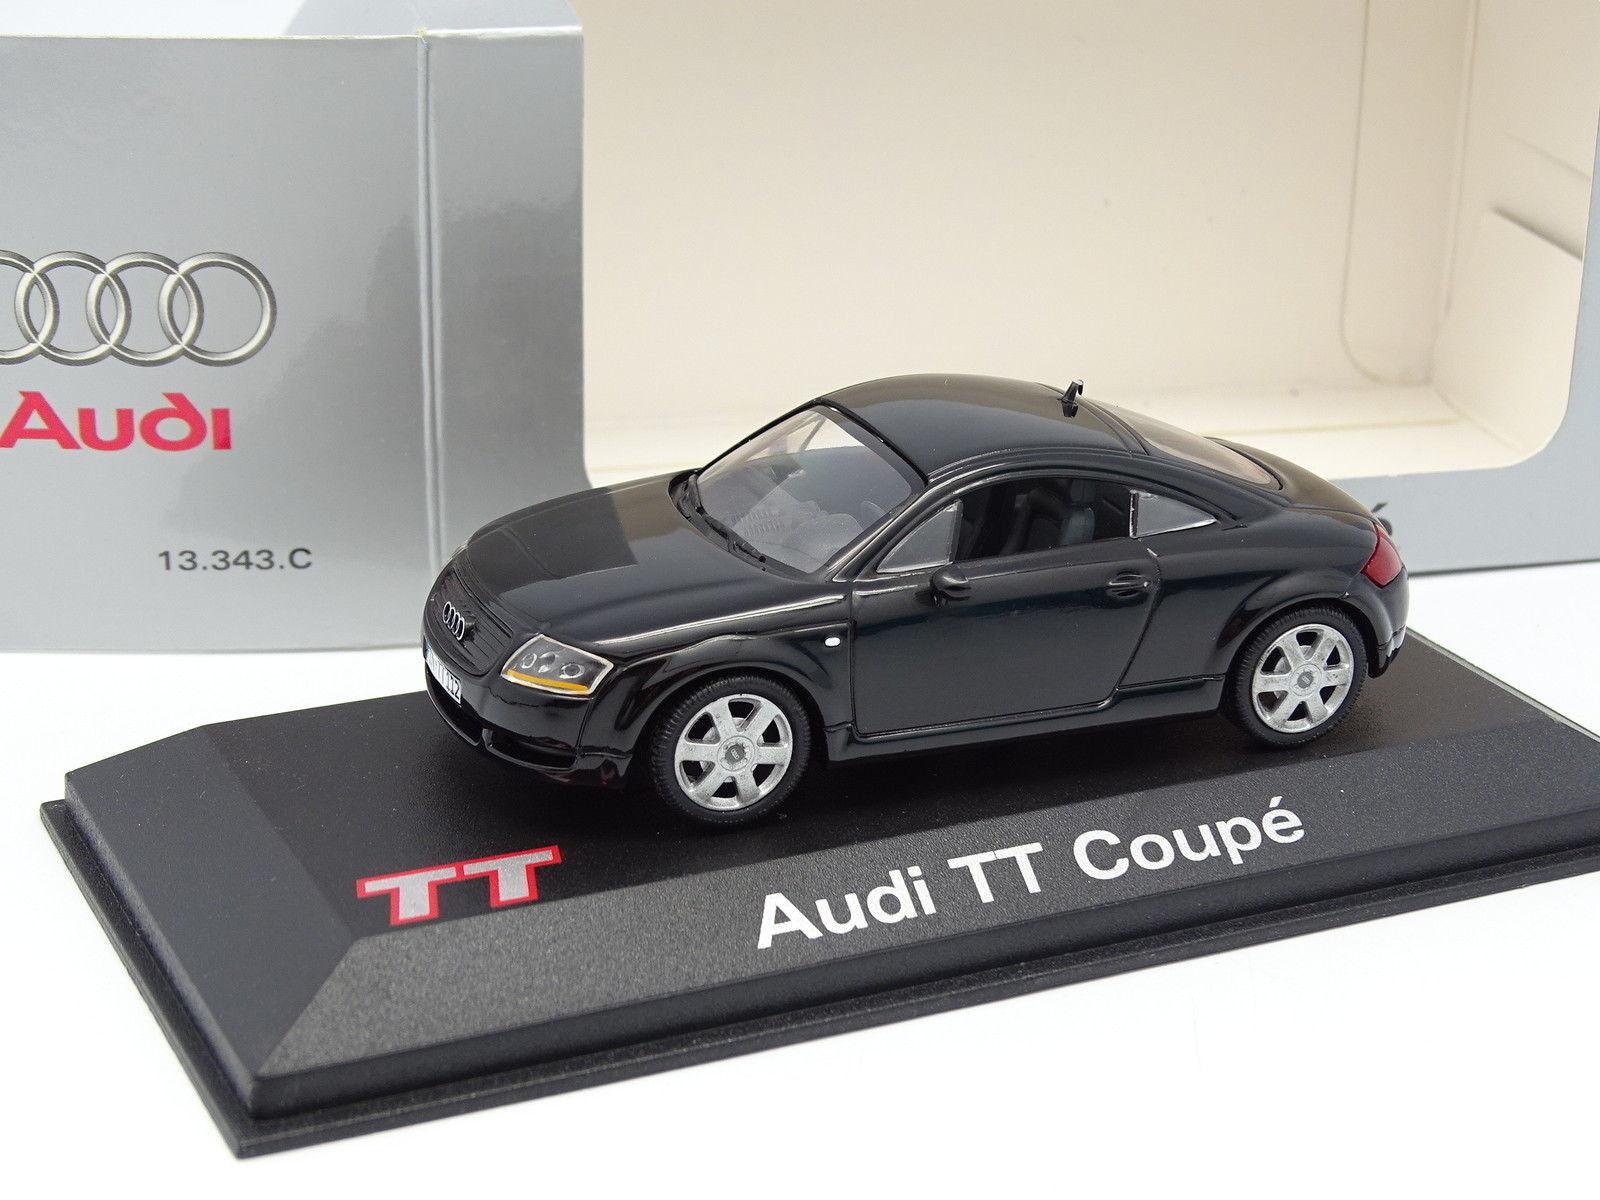 Minichamps Minichamps Minichamps 1 43 - Audi TT Coupe Negra 26092c